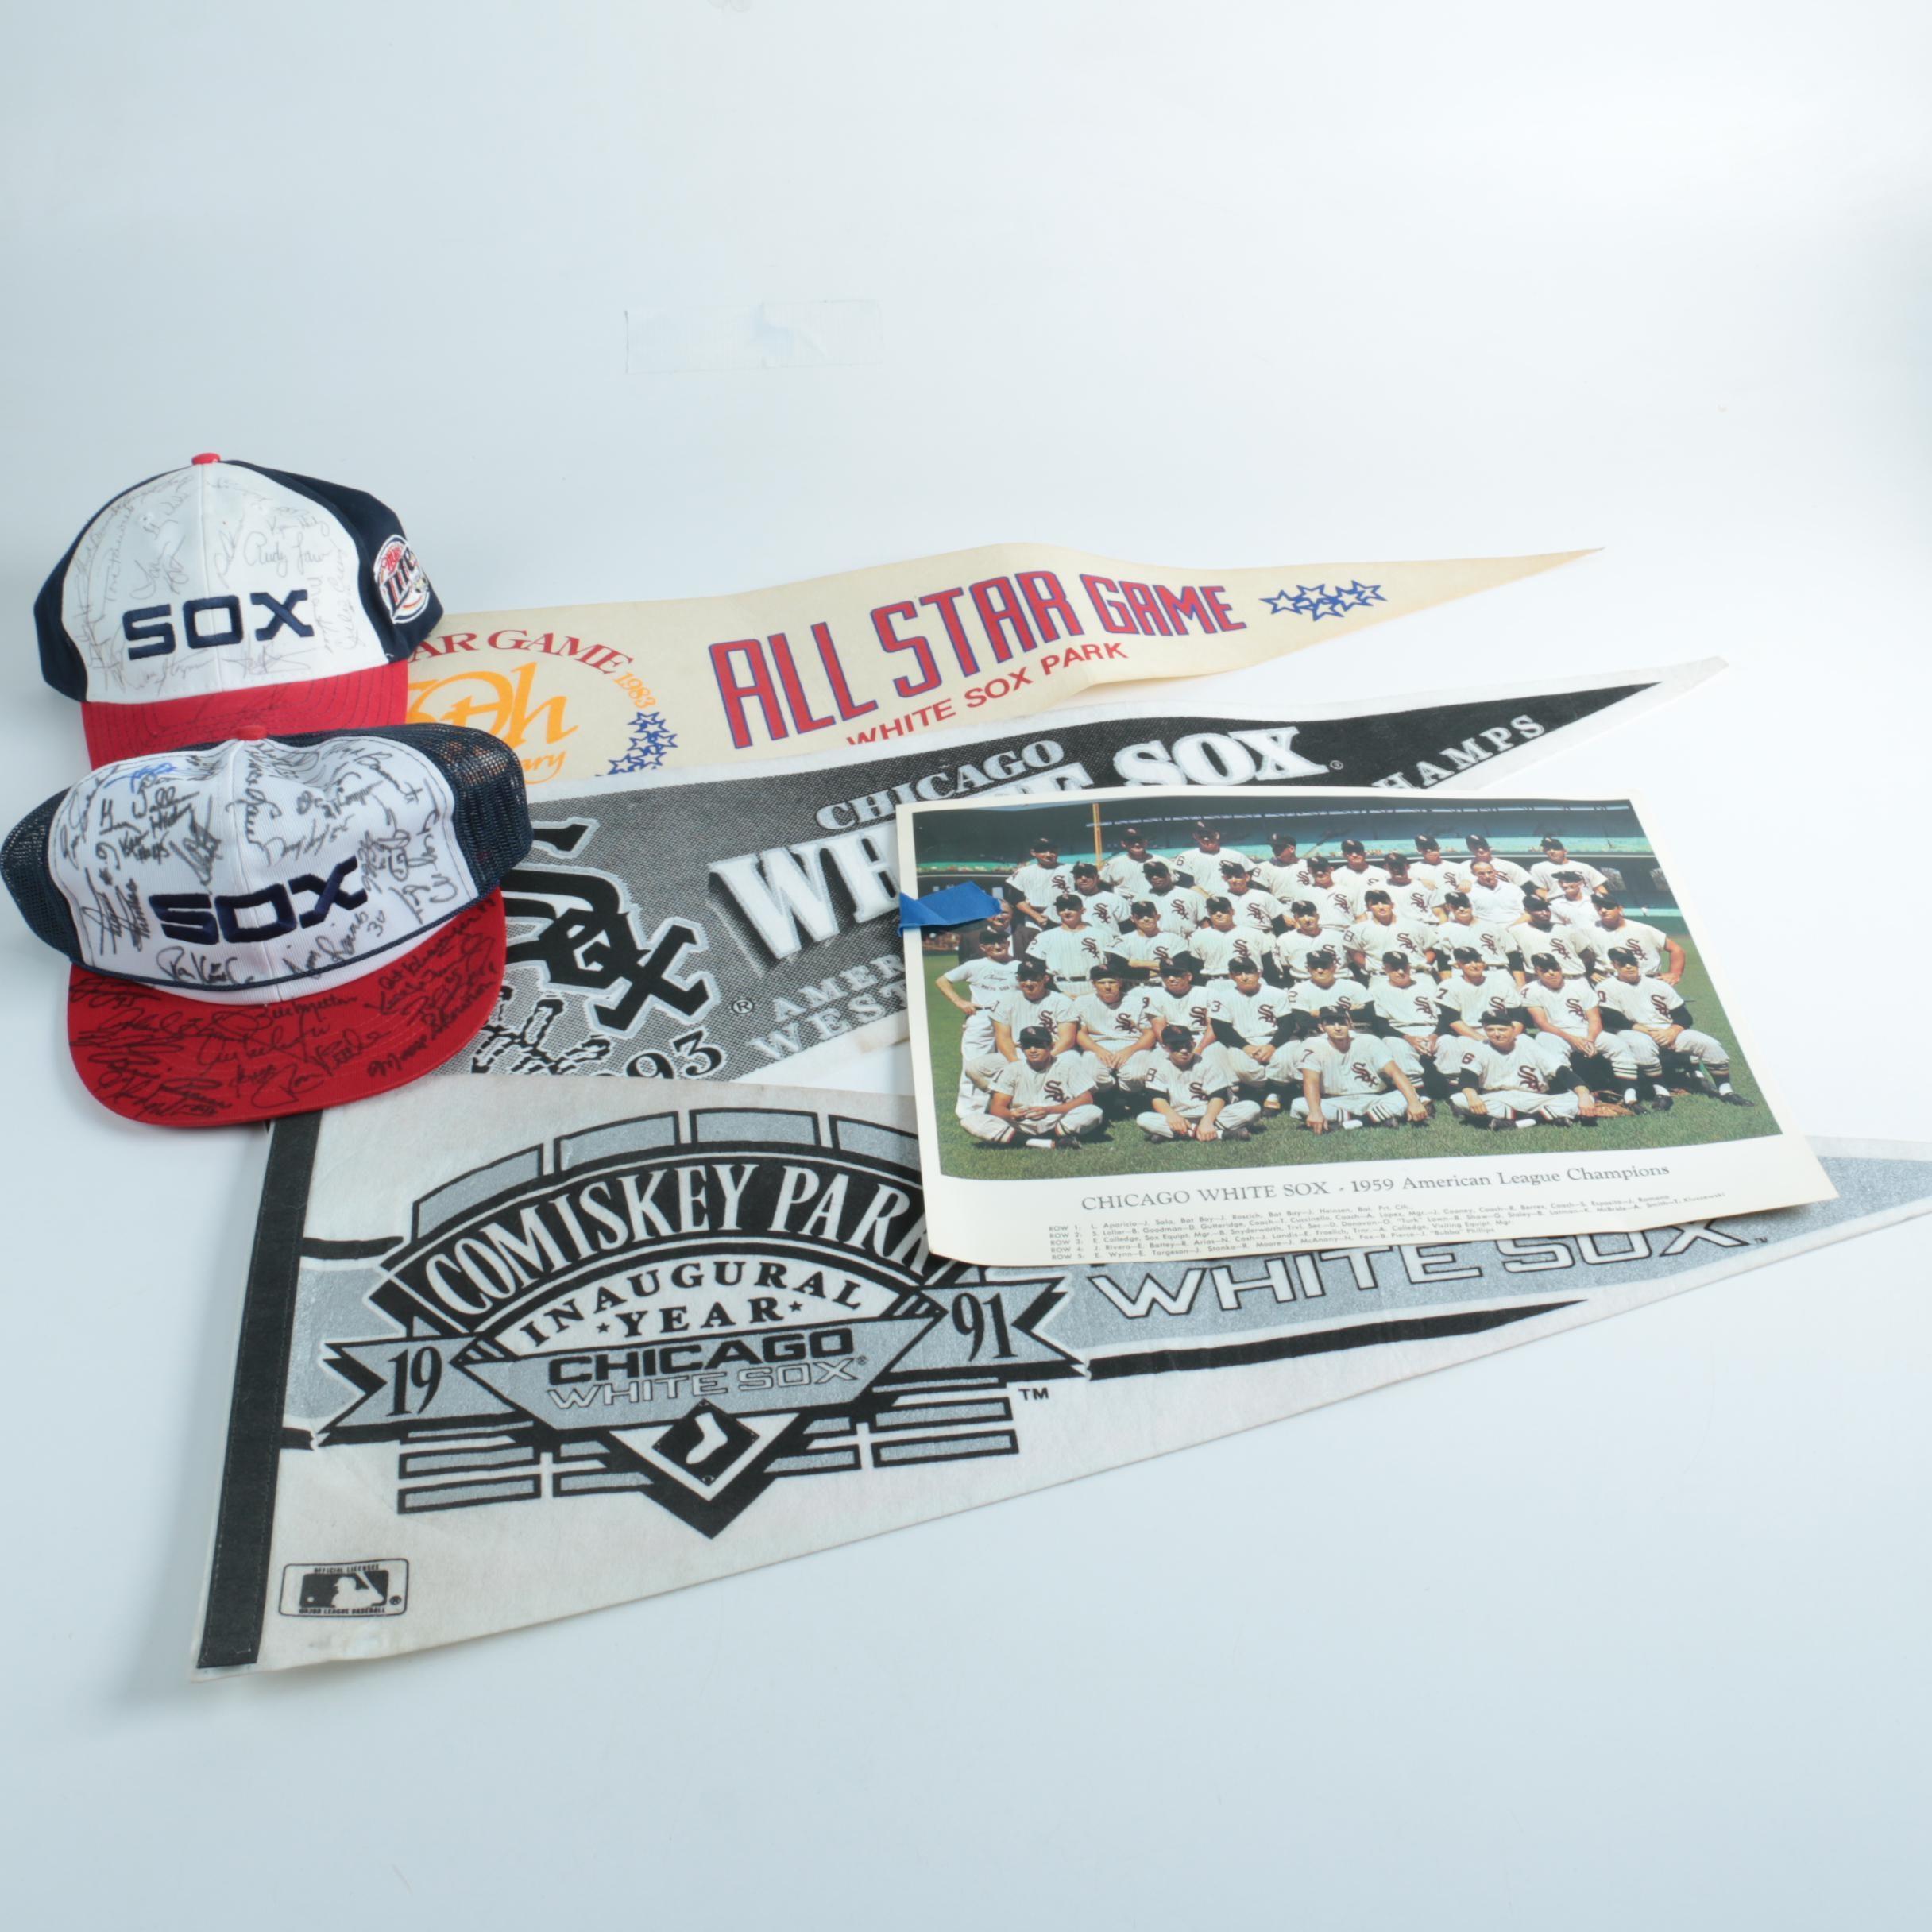 White Sox Memorabilia Including Autographed Hats